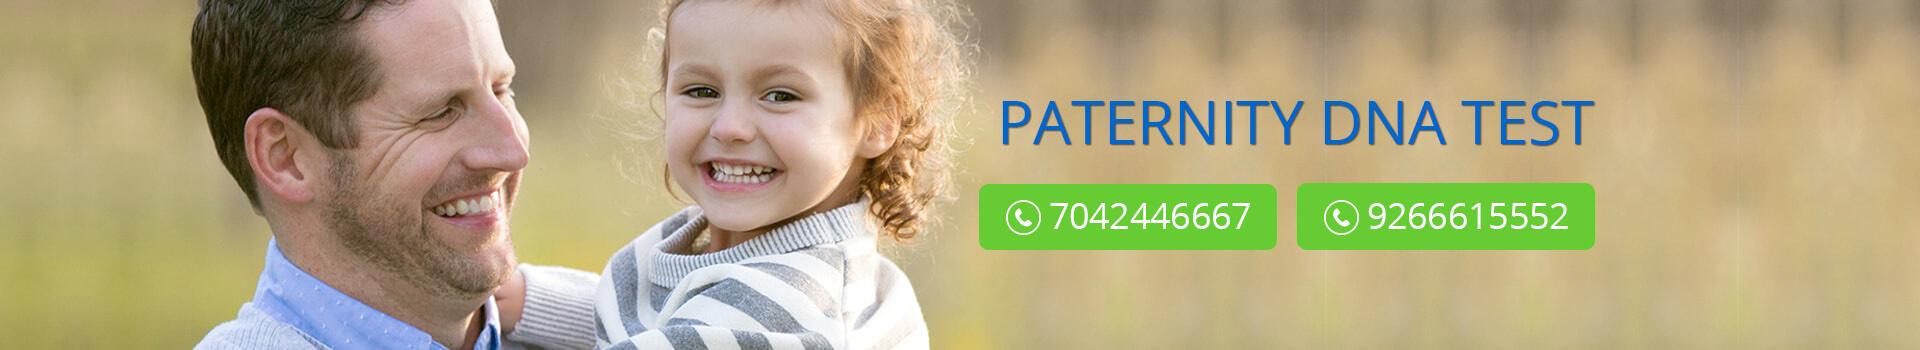 Paternity DNA Test